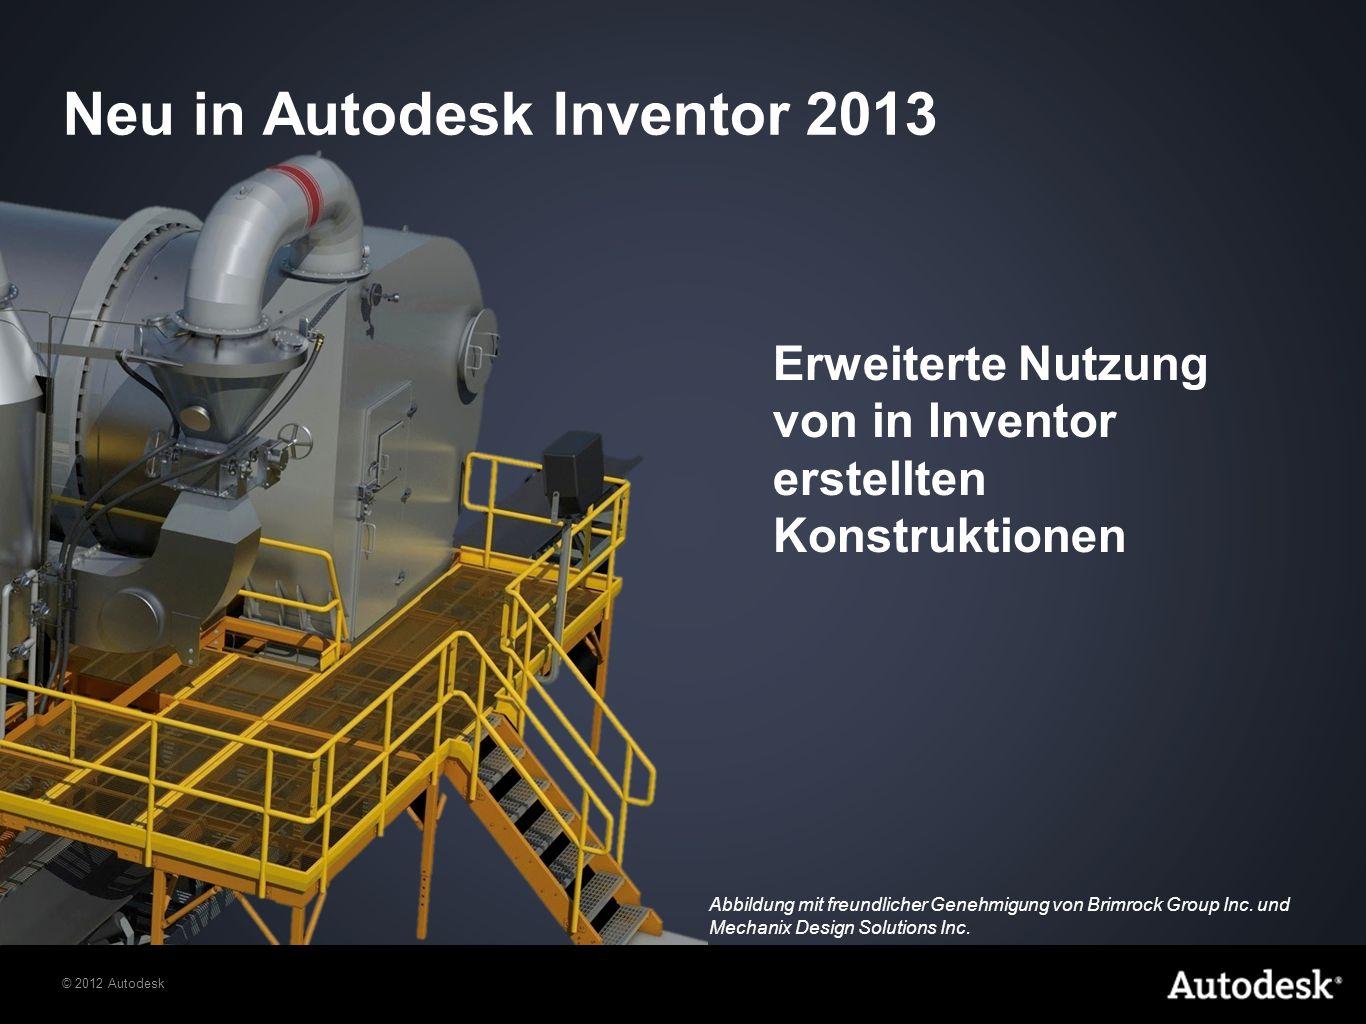 Neu in Autodesk Inventor 2013